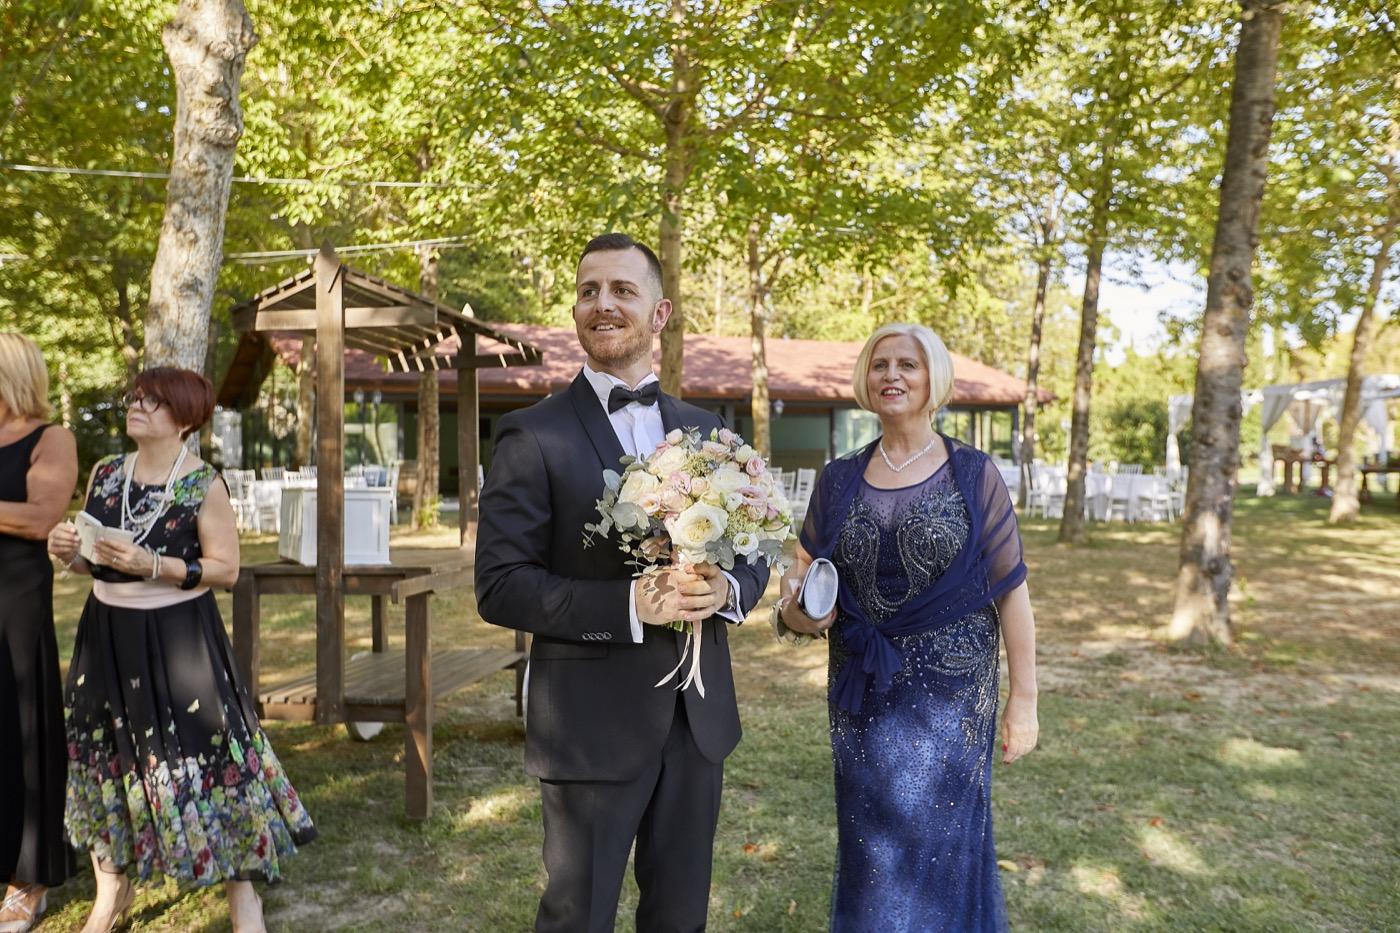 Claudio-Coppola-wedding-photographer-la-scuderia-eventi-preparativi-la-rosetta-perugia-42